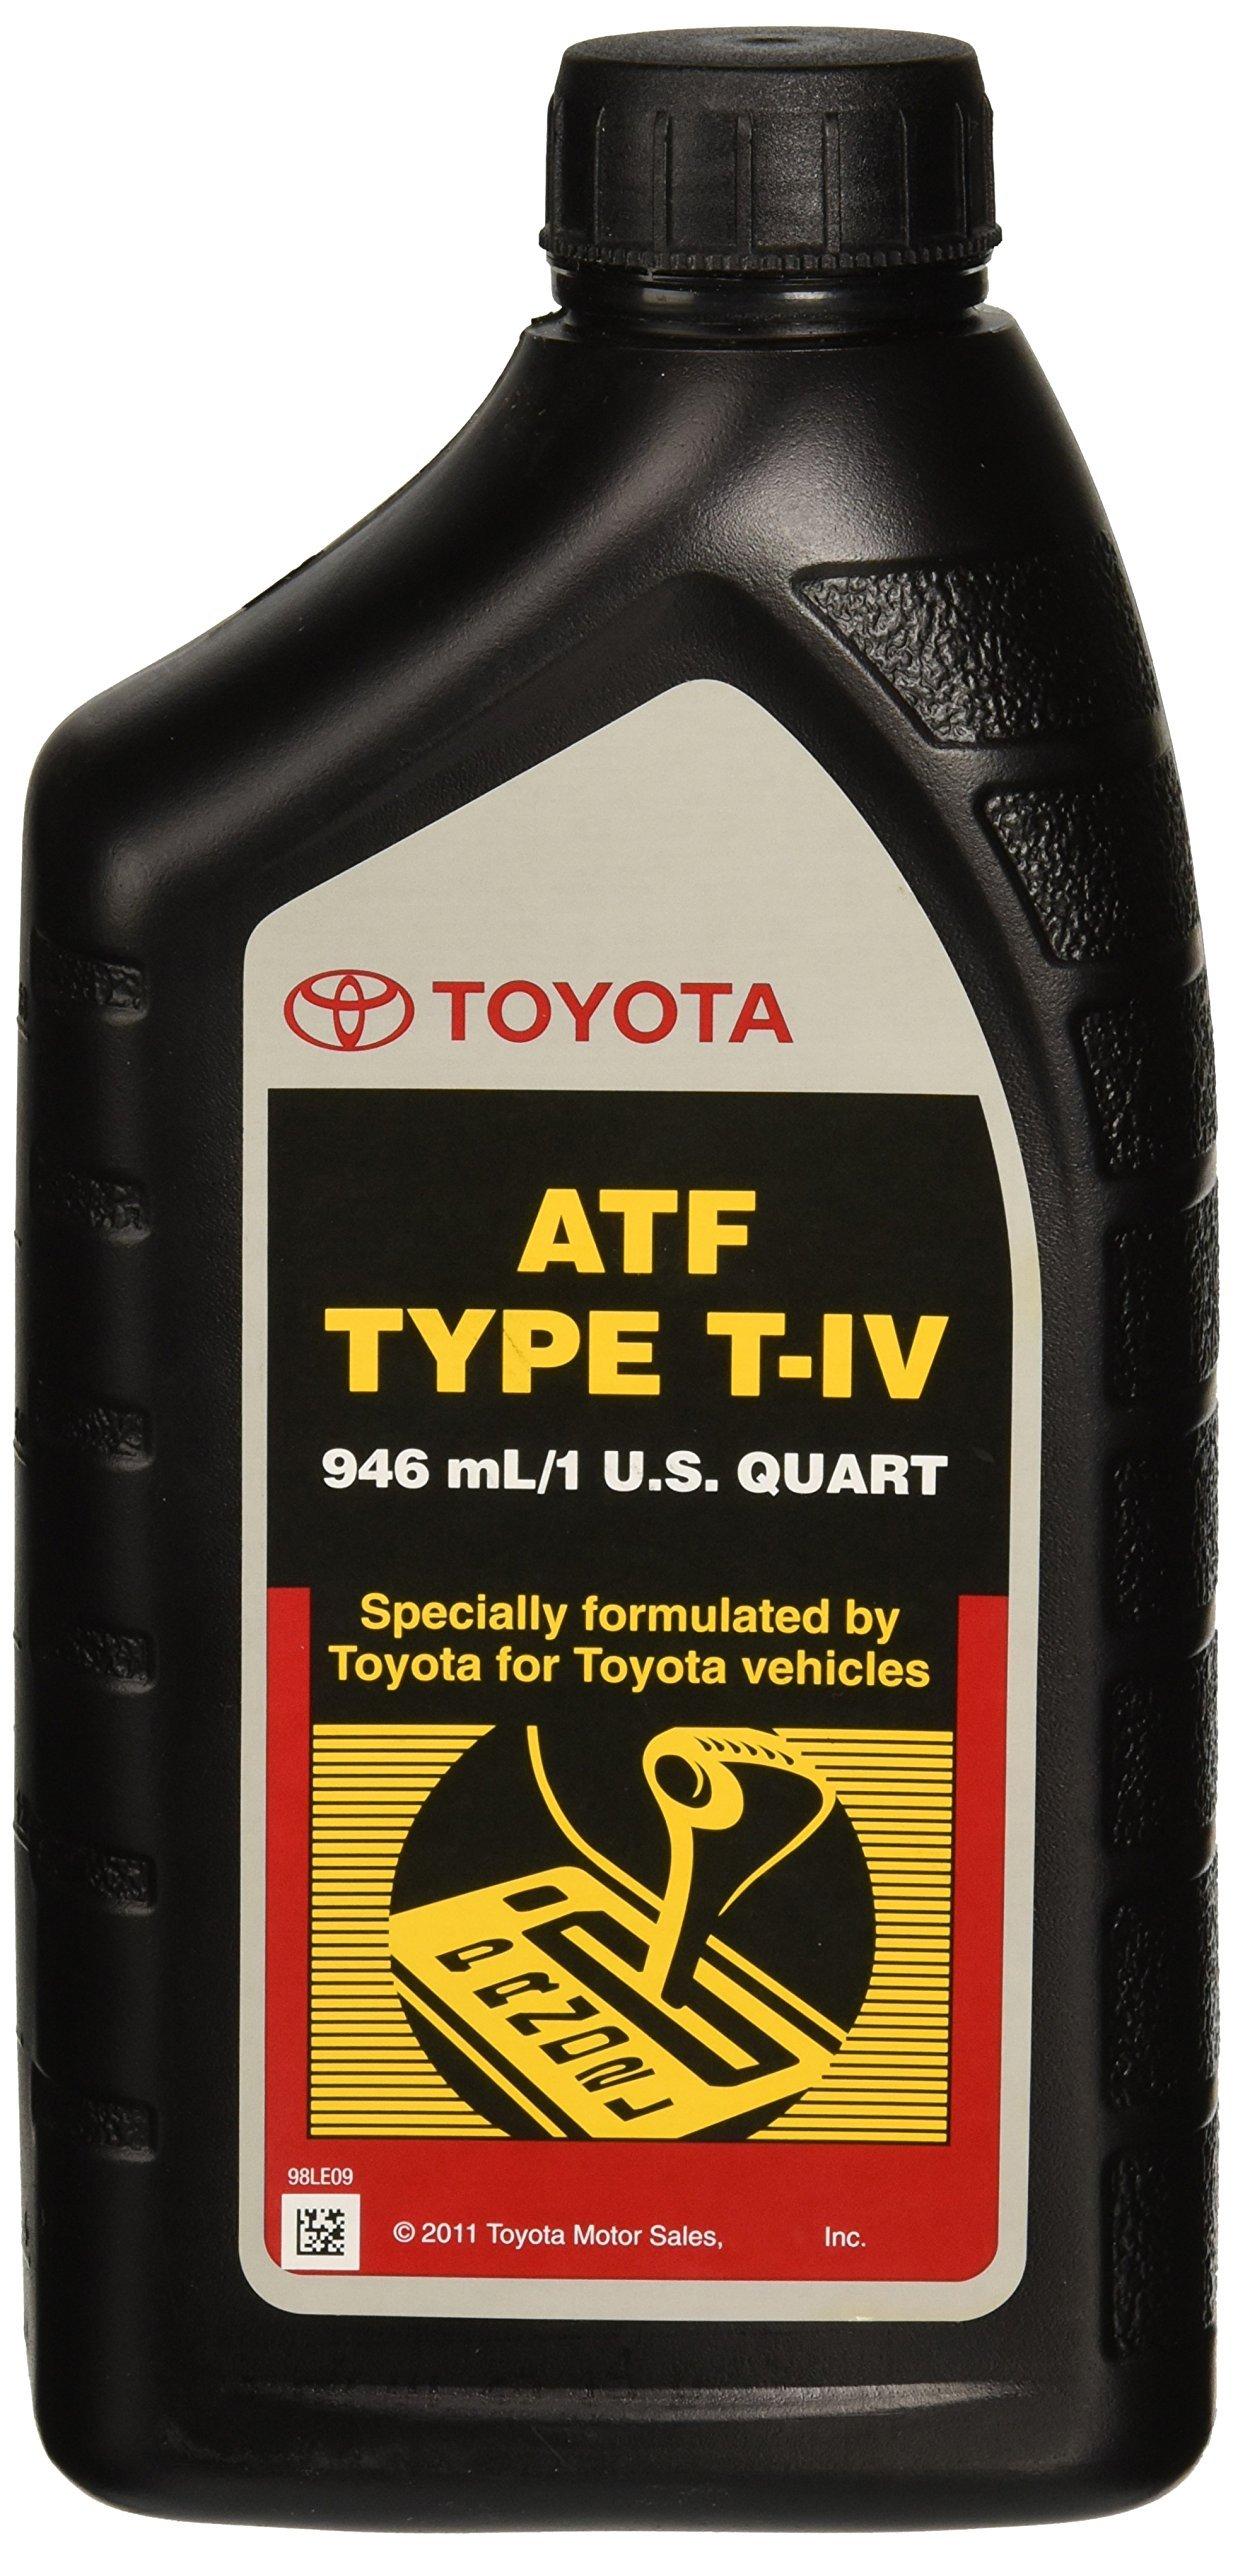 Toyota 00279-000T4-0 Lexus ATF Automatic Transmission Fluid by Toyota